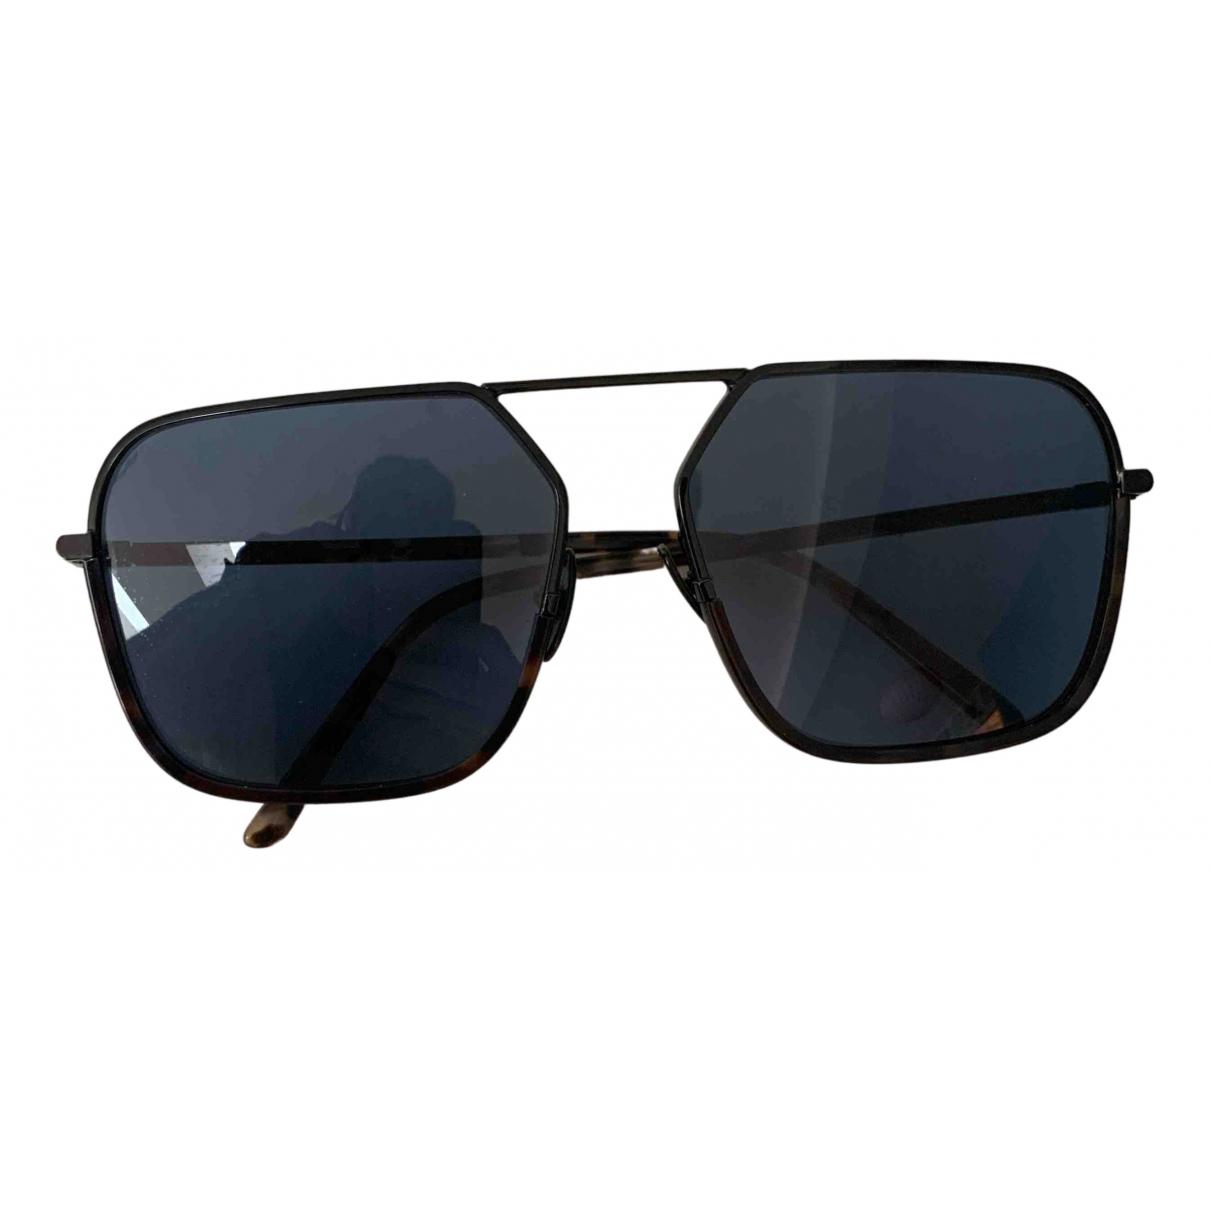 Dolce & Gabbana N Black Metal Sunglasses for Women N